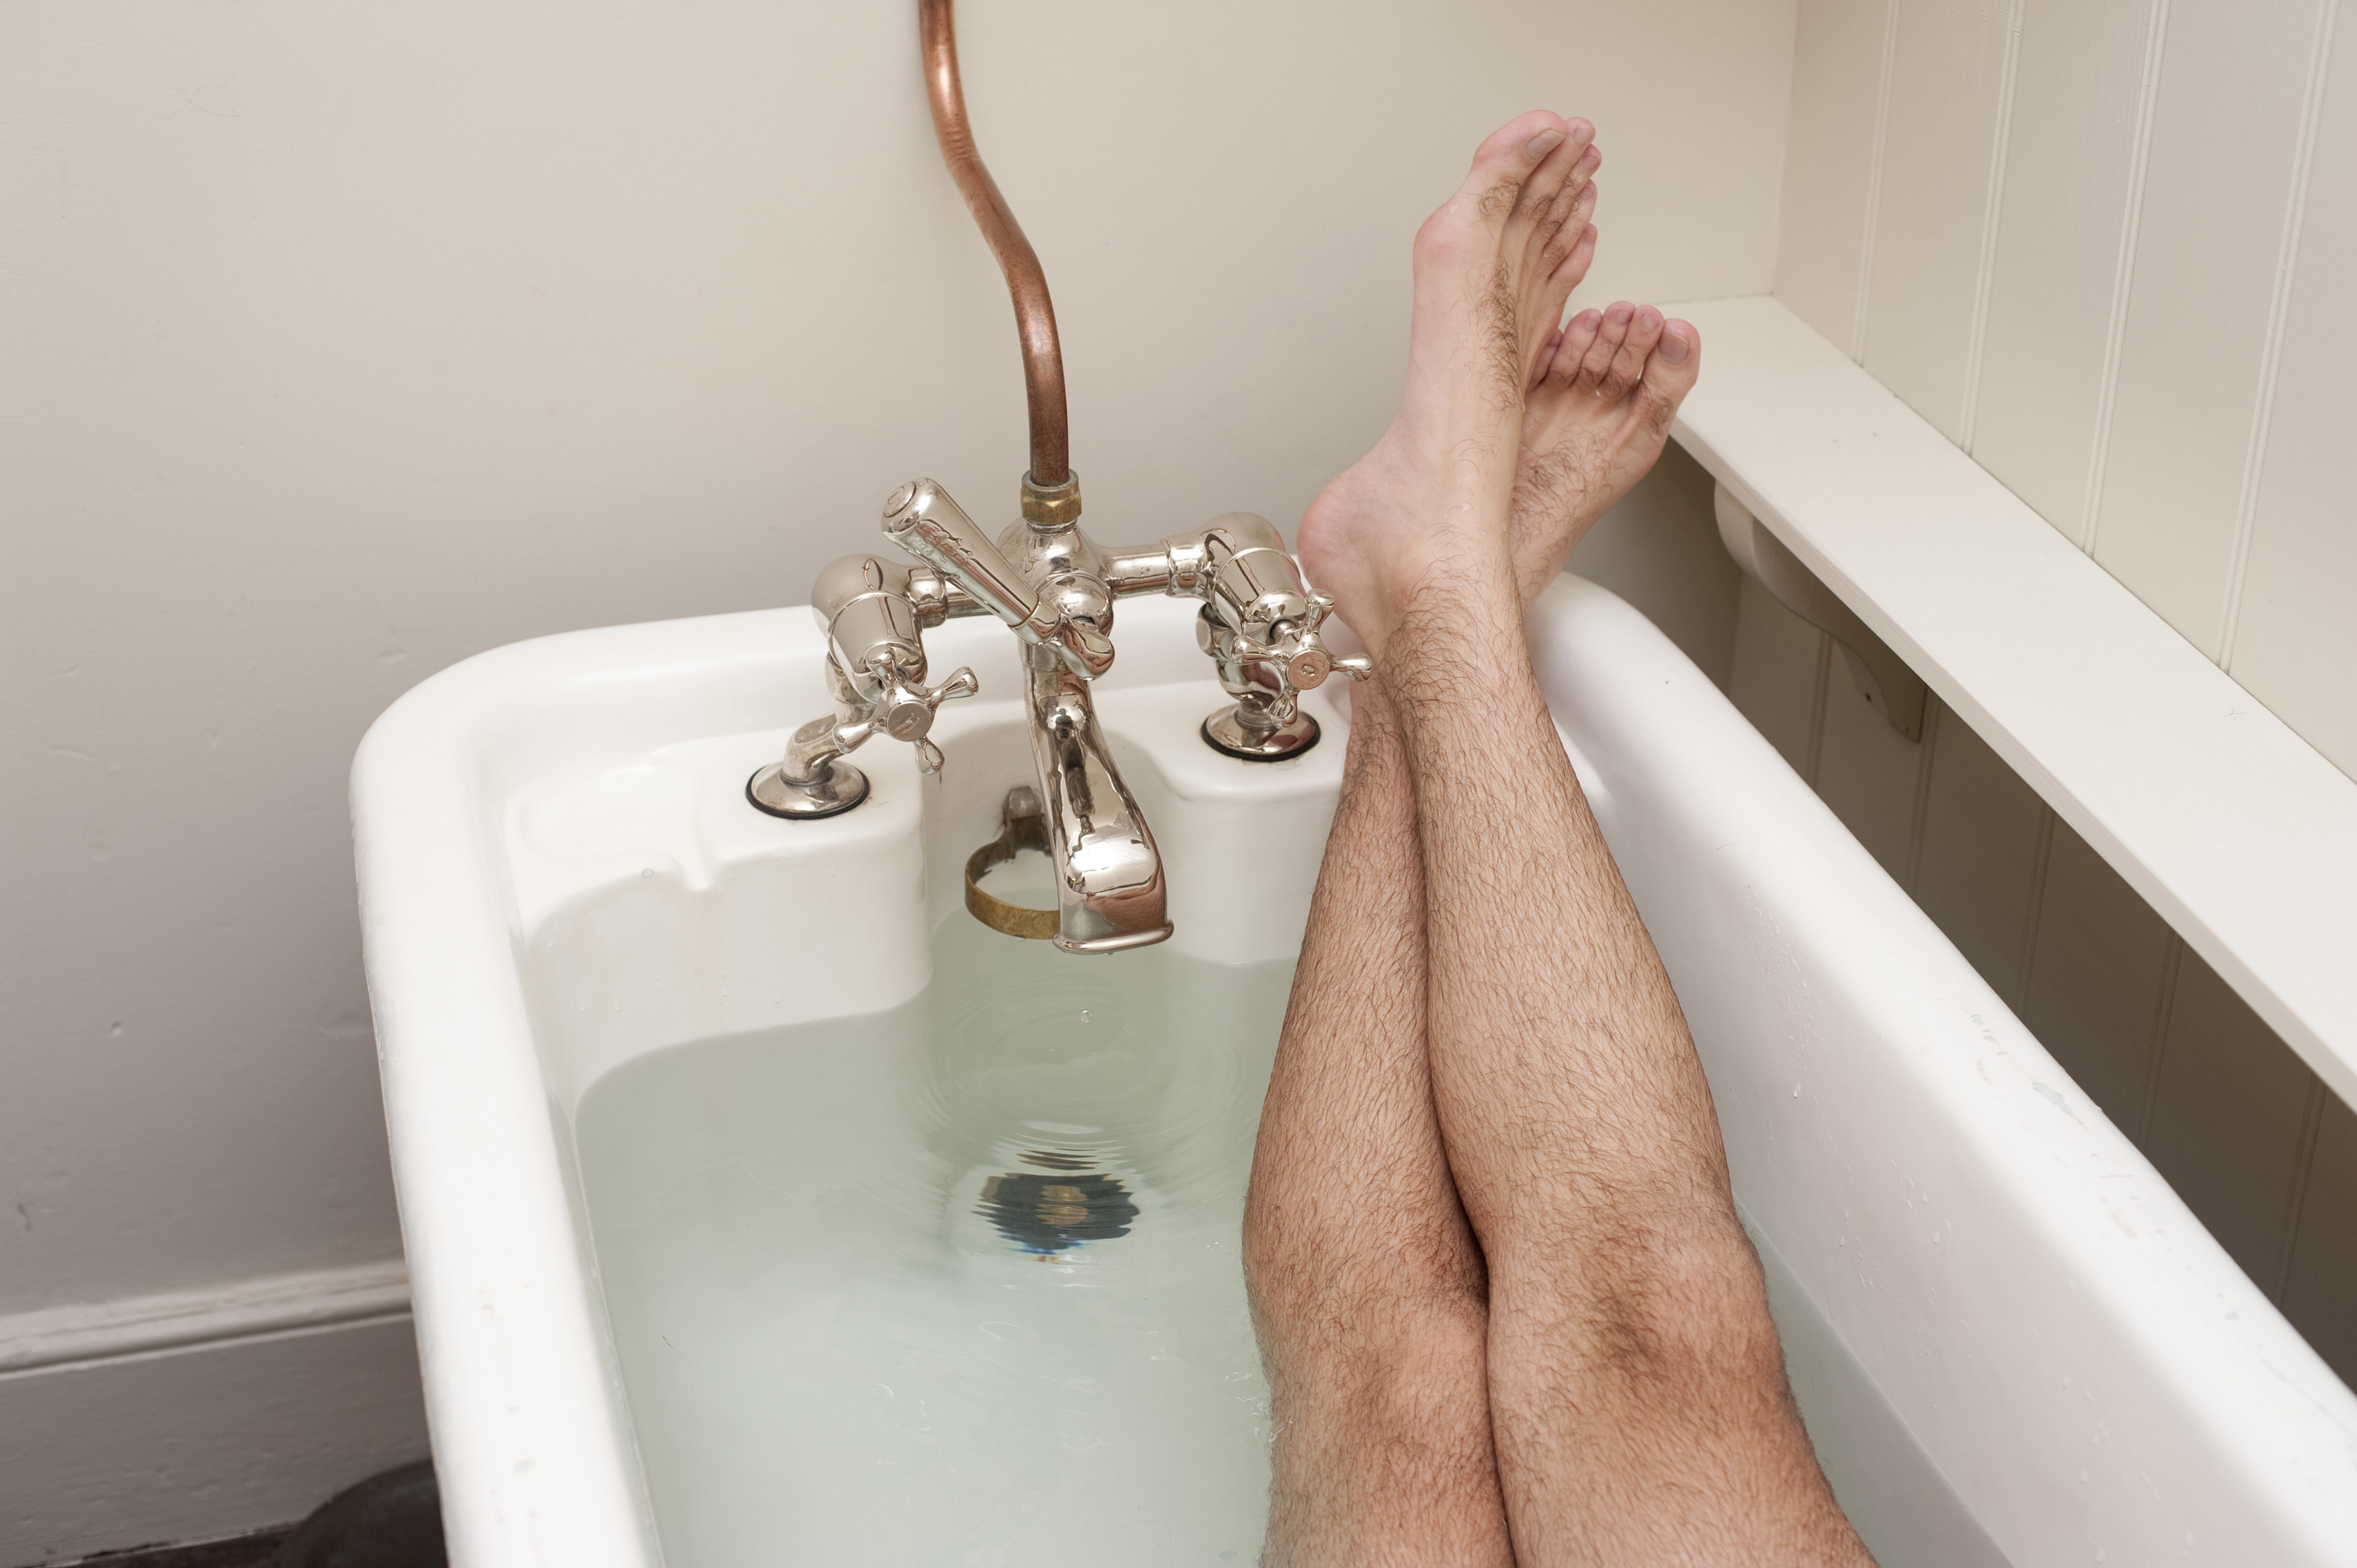 Free Stock Photo 6928 Man relaxing having a bath